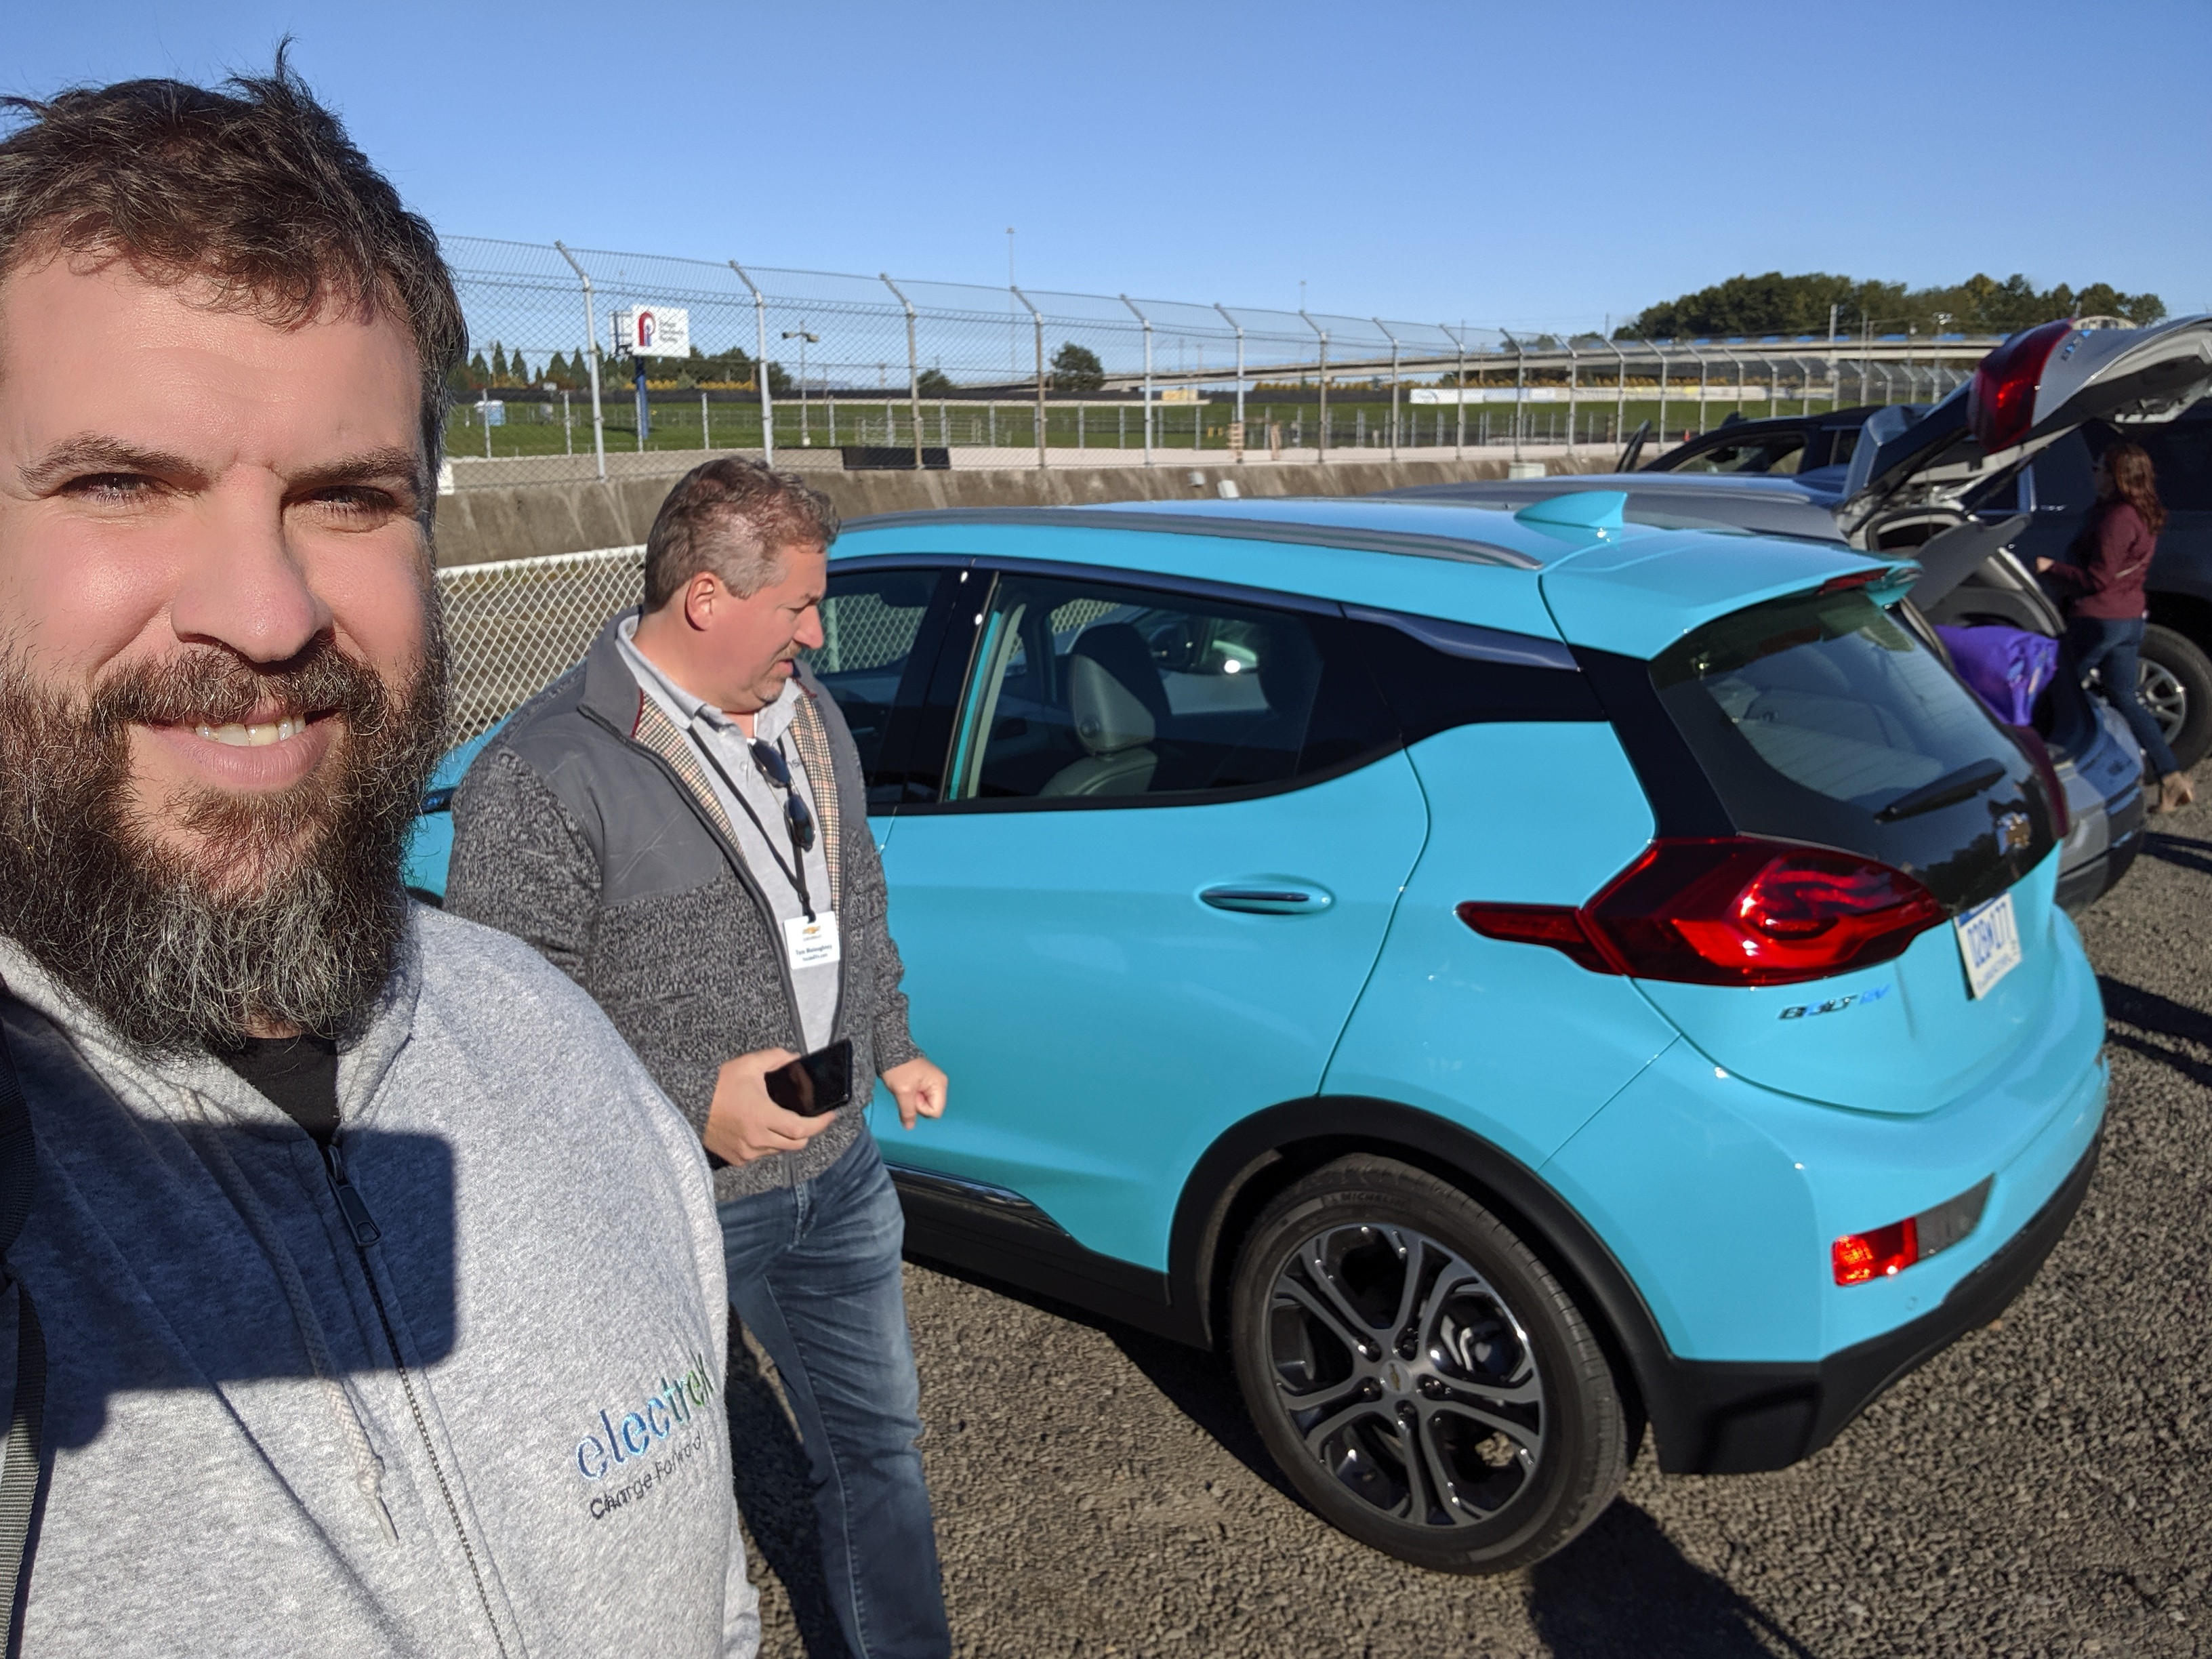 2020 Chevy Bolt Ev First Drive Felt A Lot Like 2016 Electrek